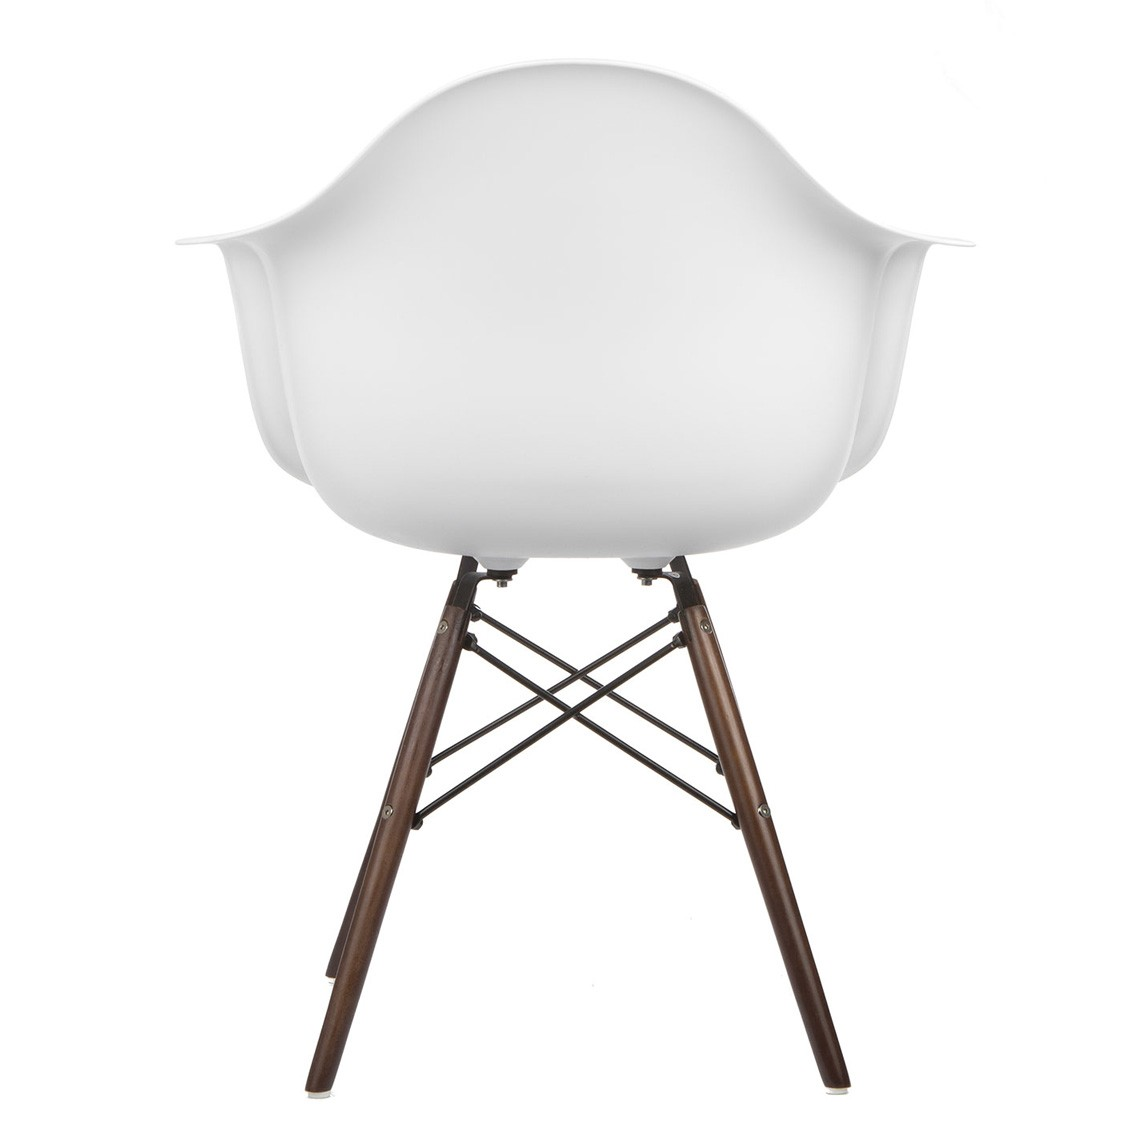 home daw molded white plastic dining armchair with dark walnut wood